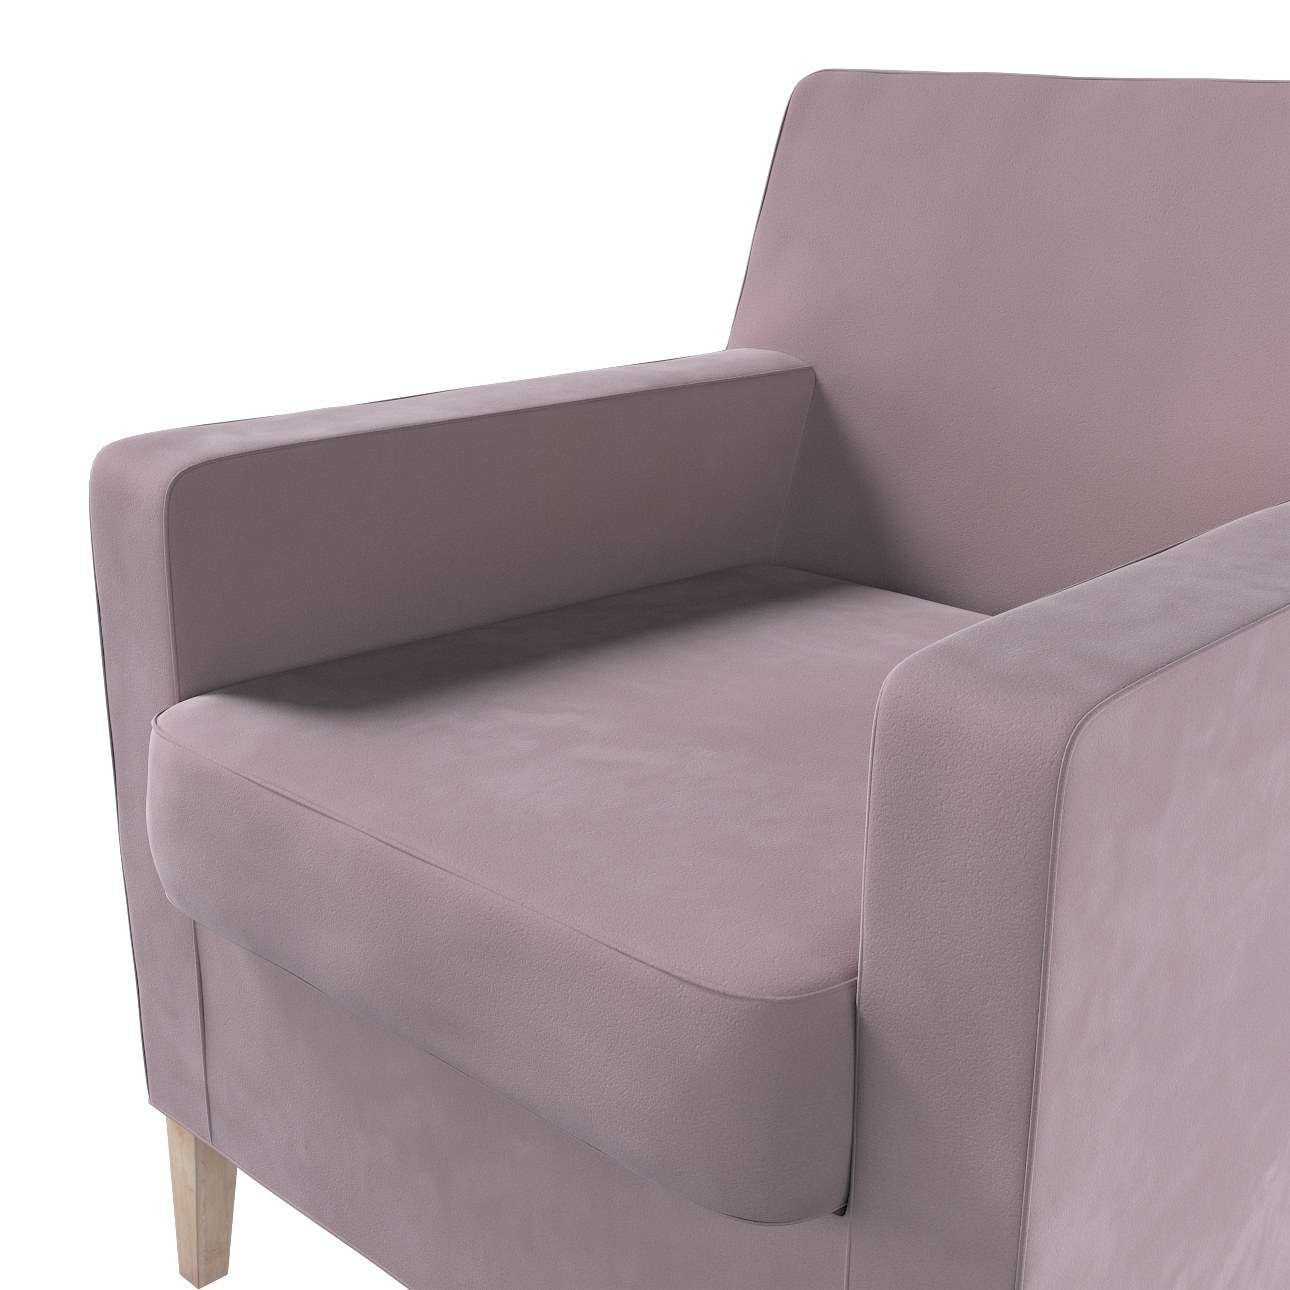 Pokrowiec na fotel Karlstad w kolekcji Velvet, tkanina: 704-14